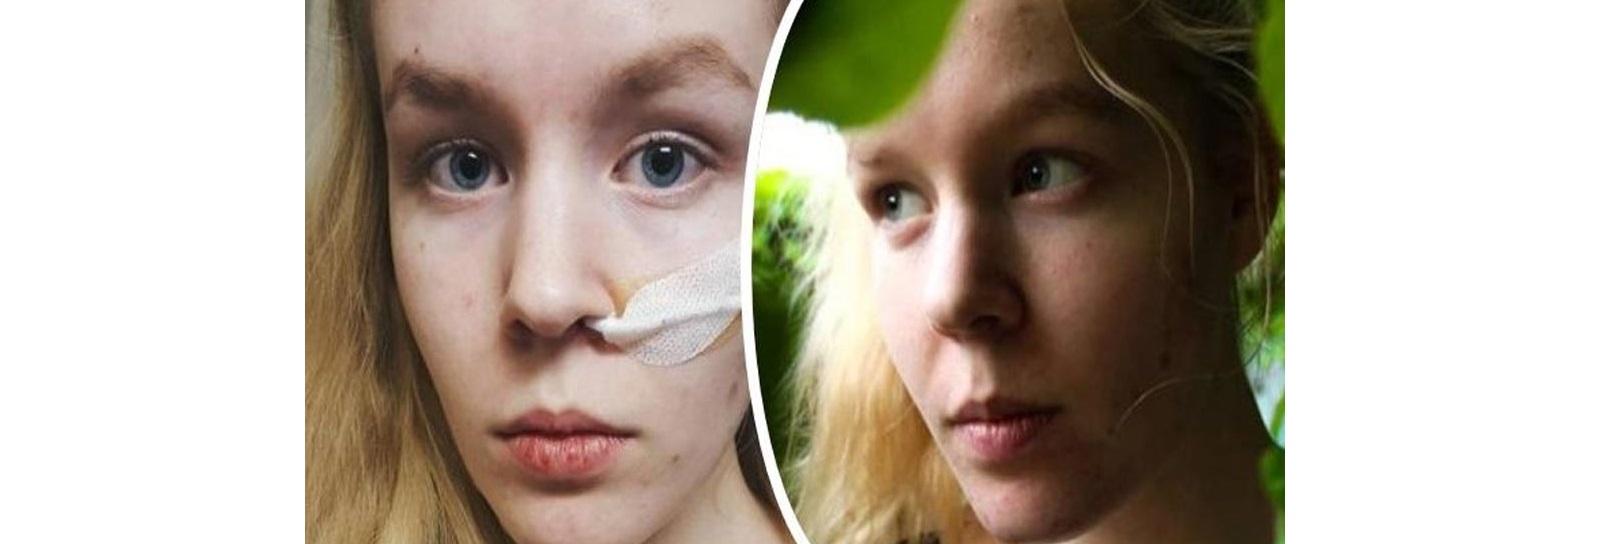 Le conceden a joven de 17 años morir por eutanasia tras sufrir 3 abusos